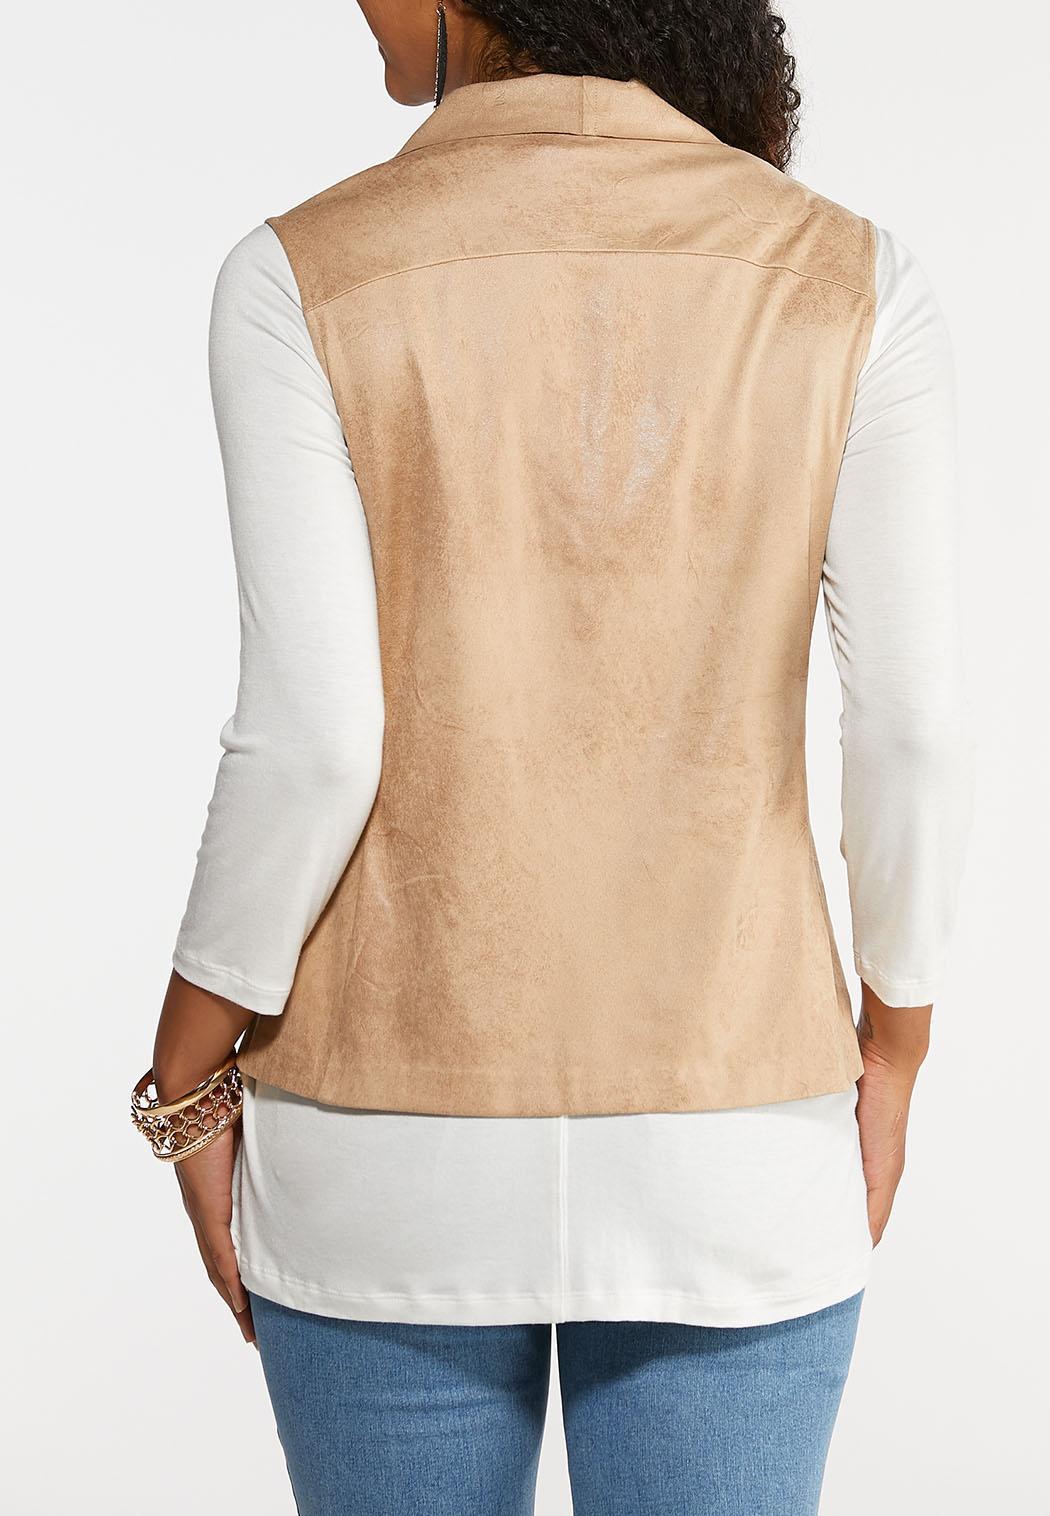 Drape Suede Vest (Item #43960185)